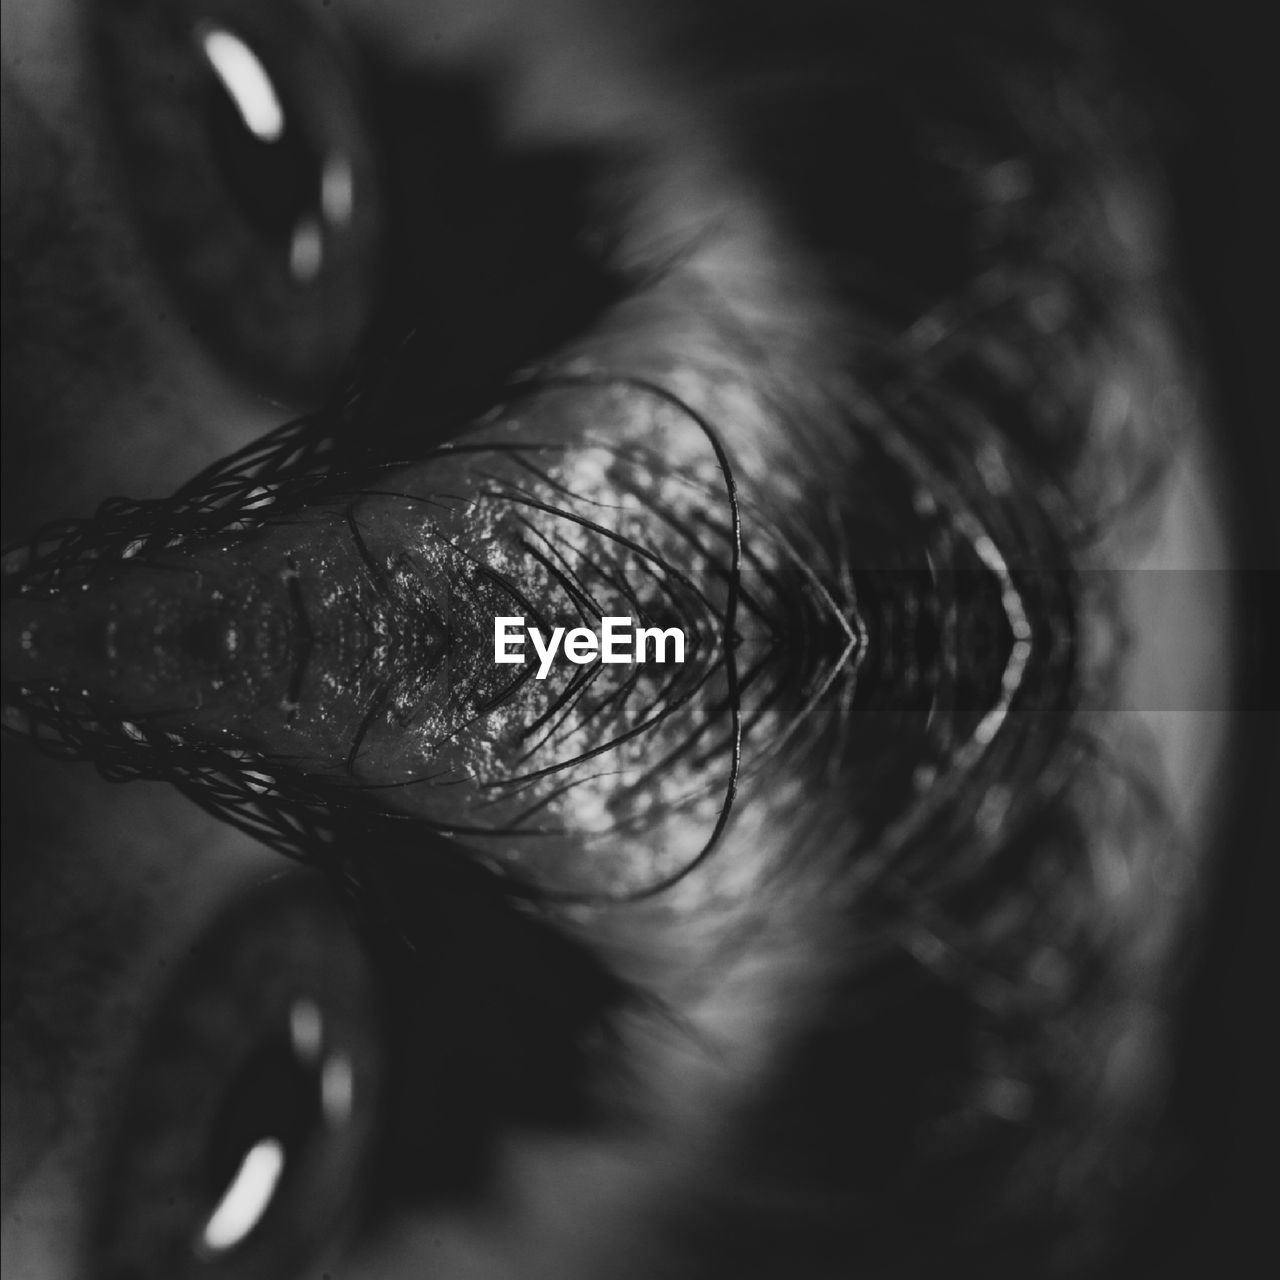 Cropped image of human eye